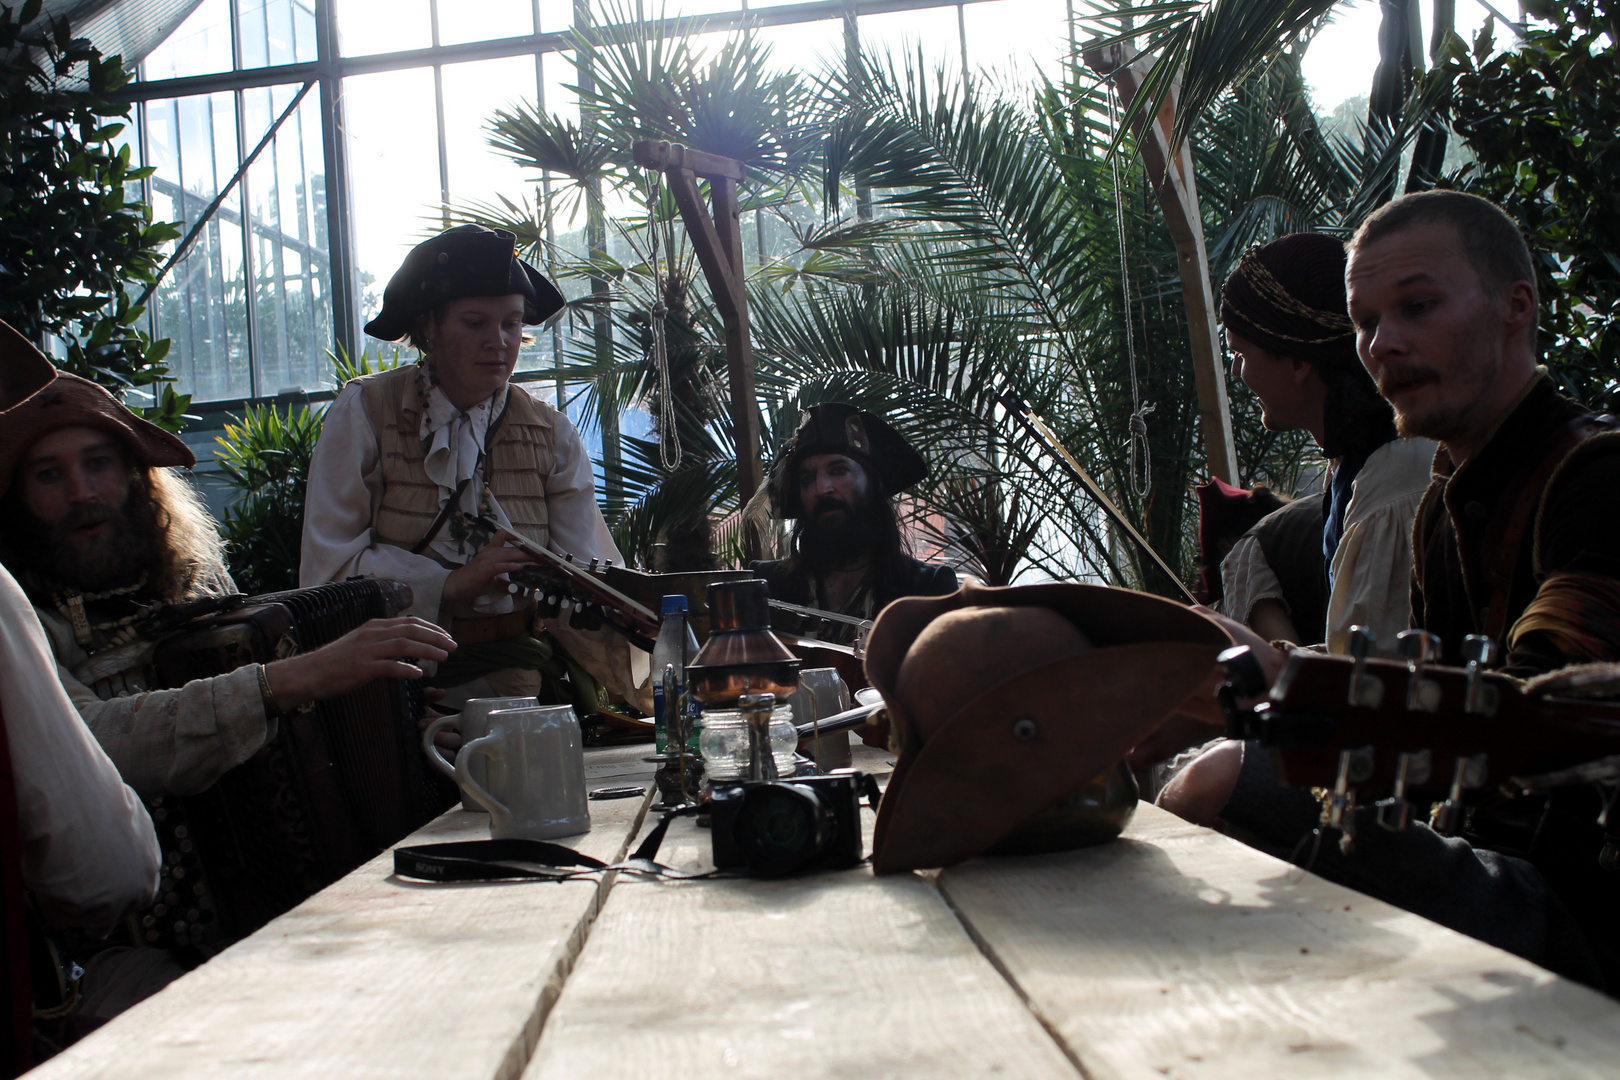 Ye Banished Privateers. Schwedische Piraten Band